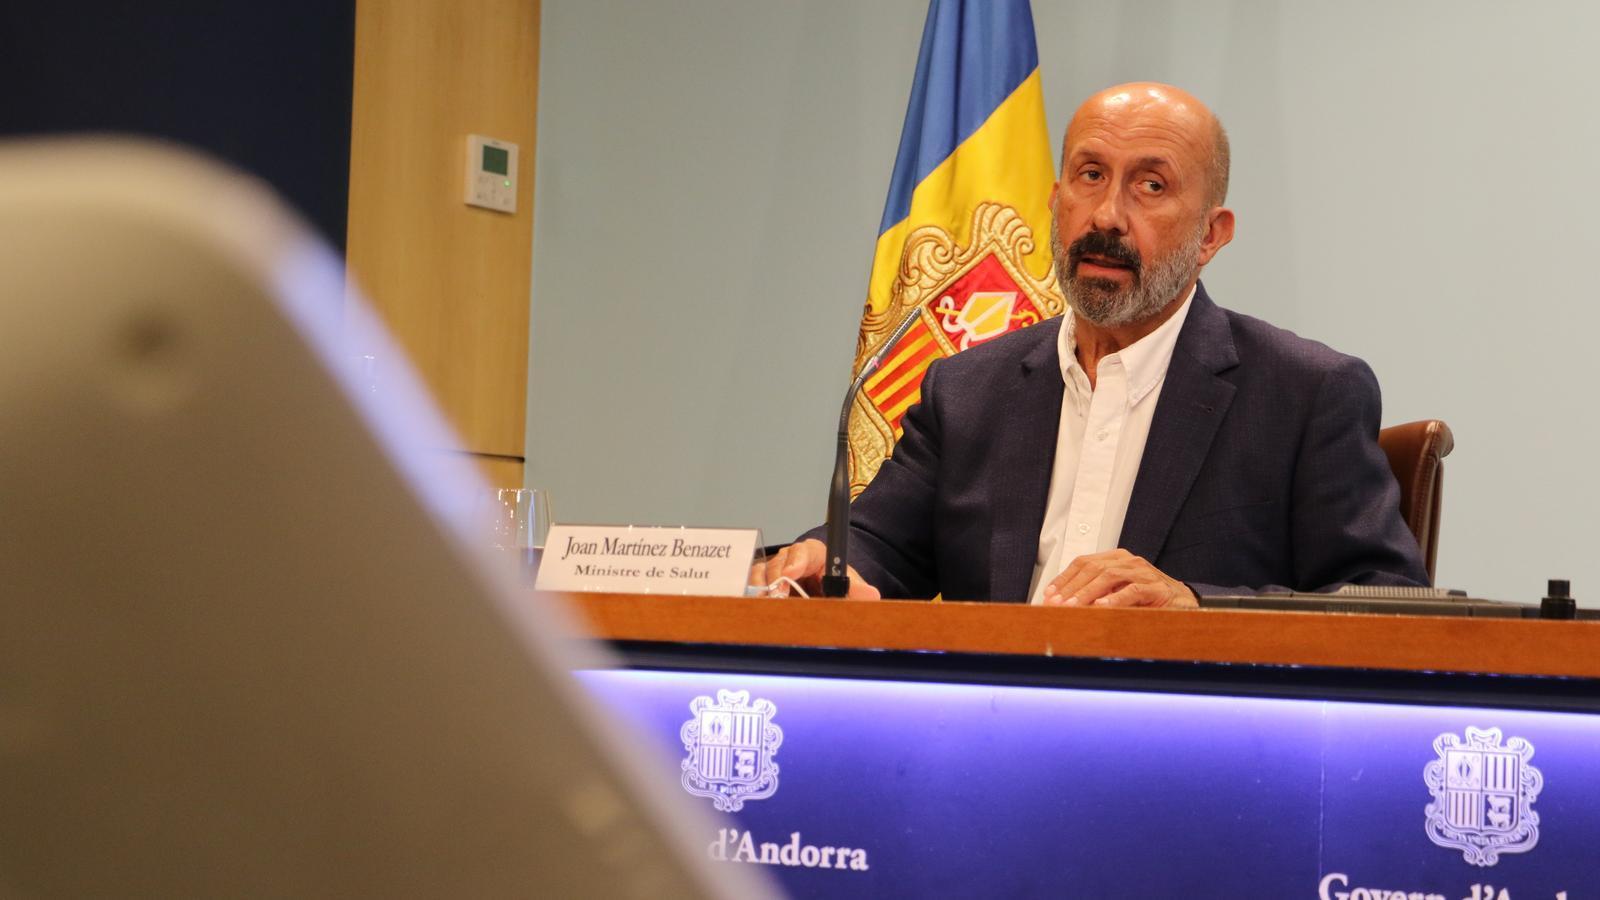 El ministre de Salut, Joan Martínez Benazet. / E.C. (ANA)